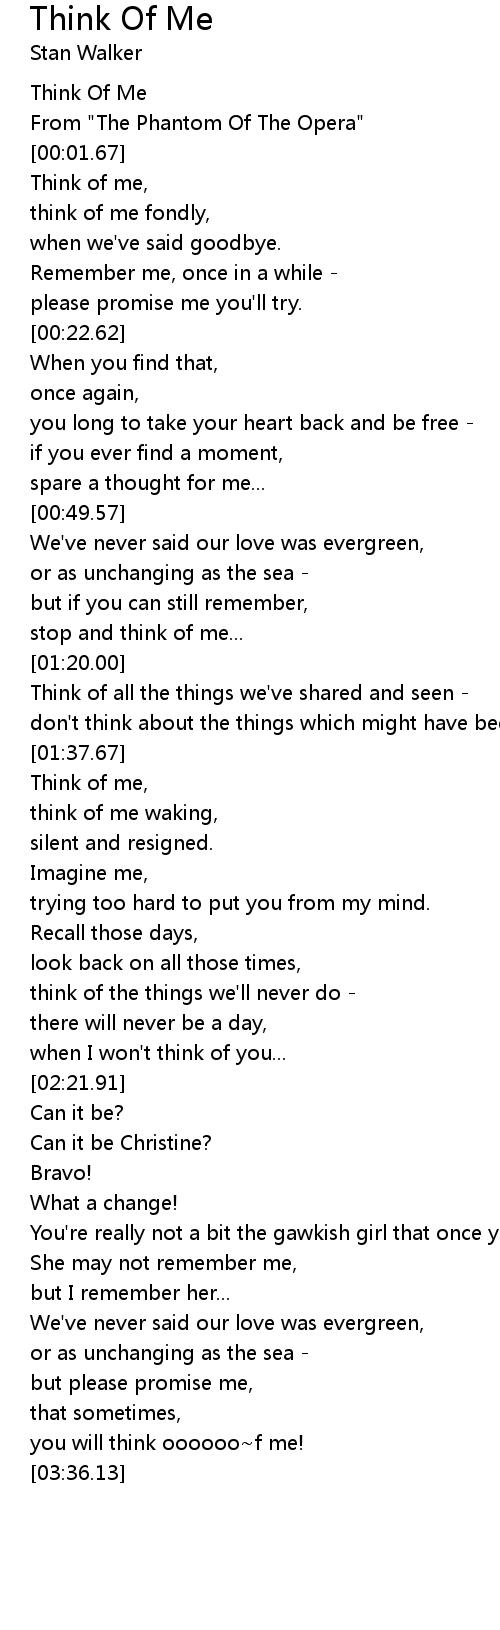 Think Of Me Lyrics   Follow Lyrics